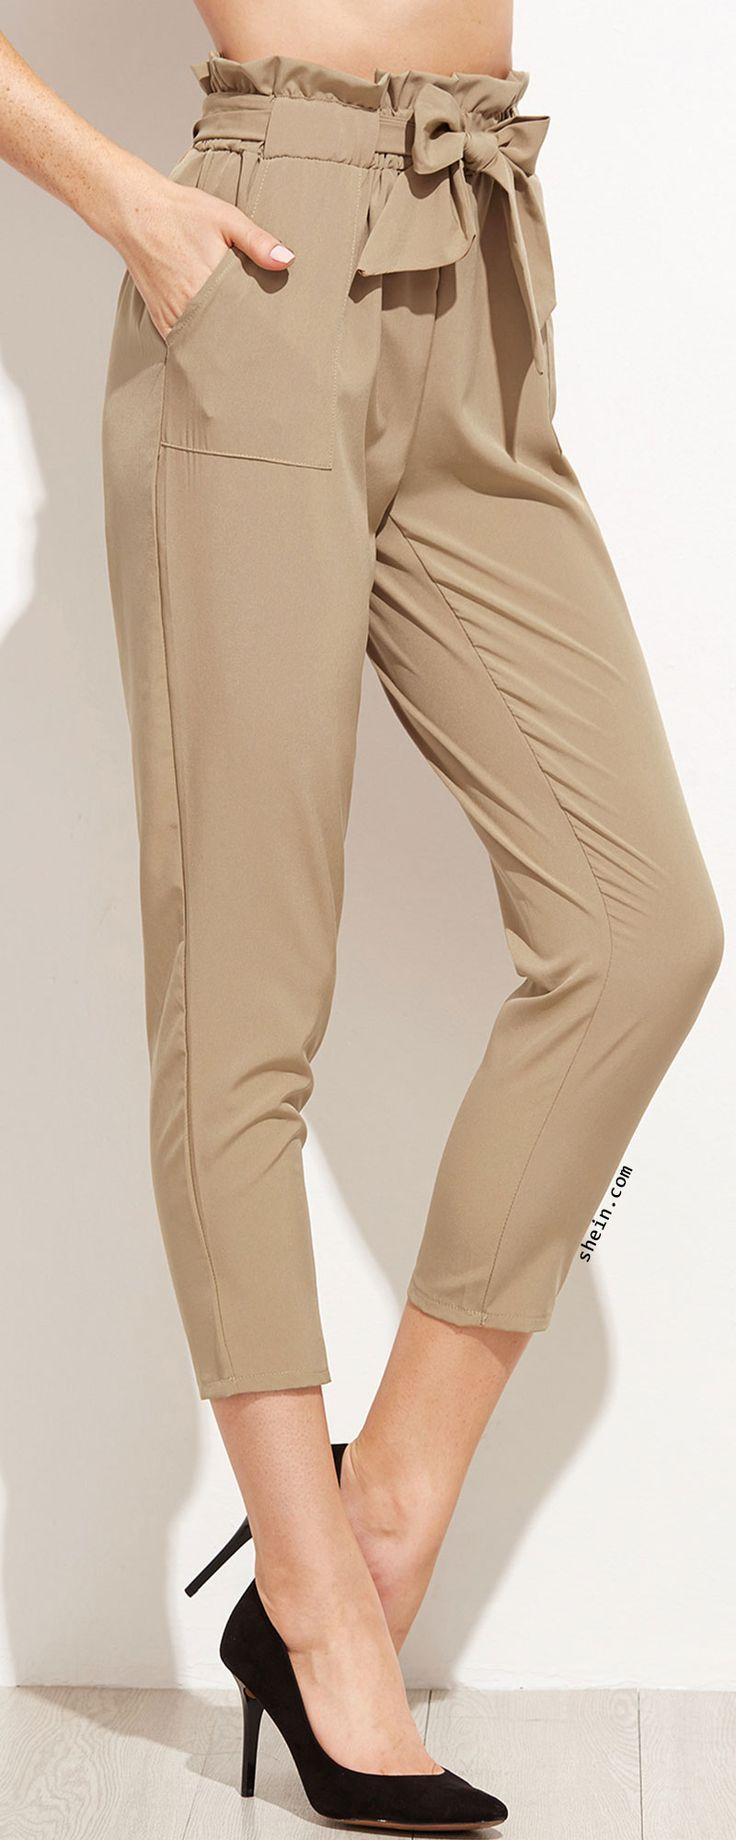 Khaki Tie Waist Ruffle Peg Pants